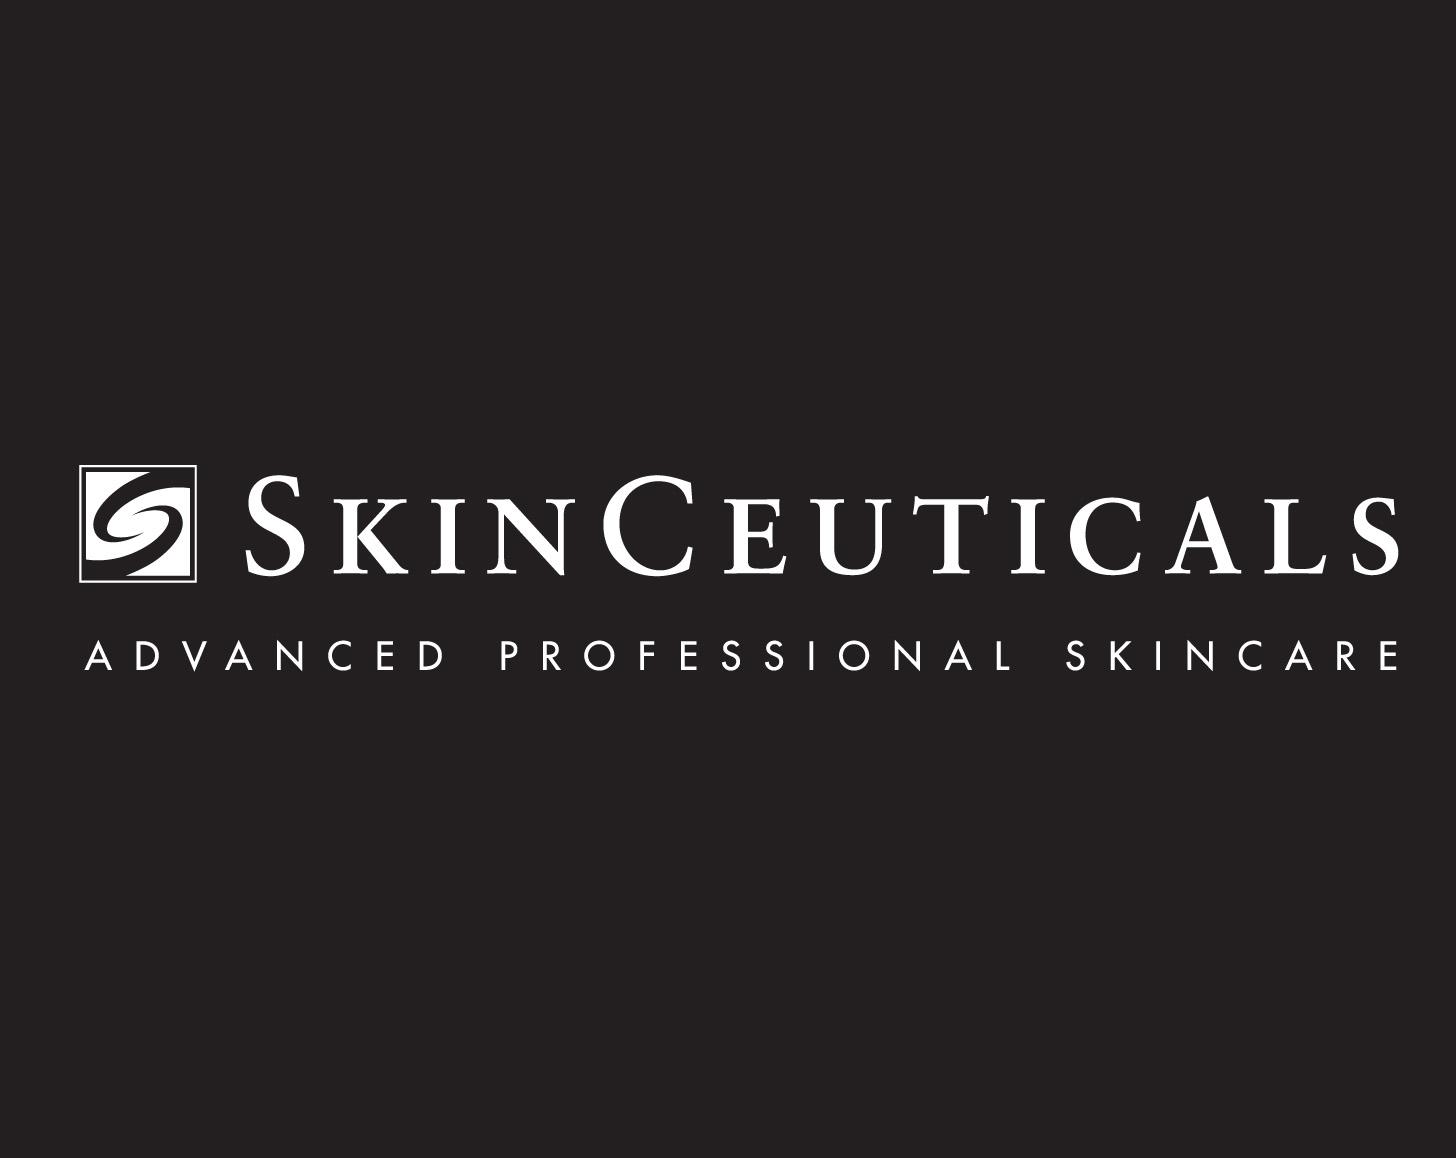 Logo SkinCeuticals fond noir